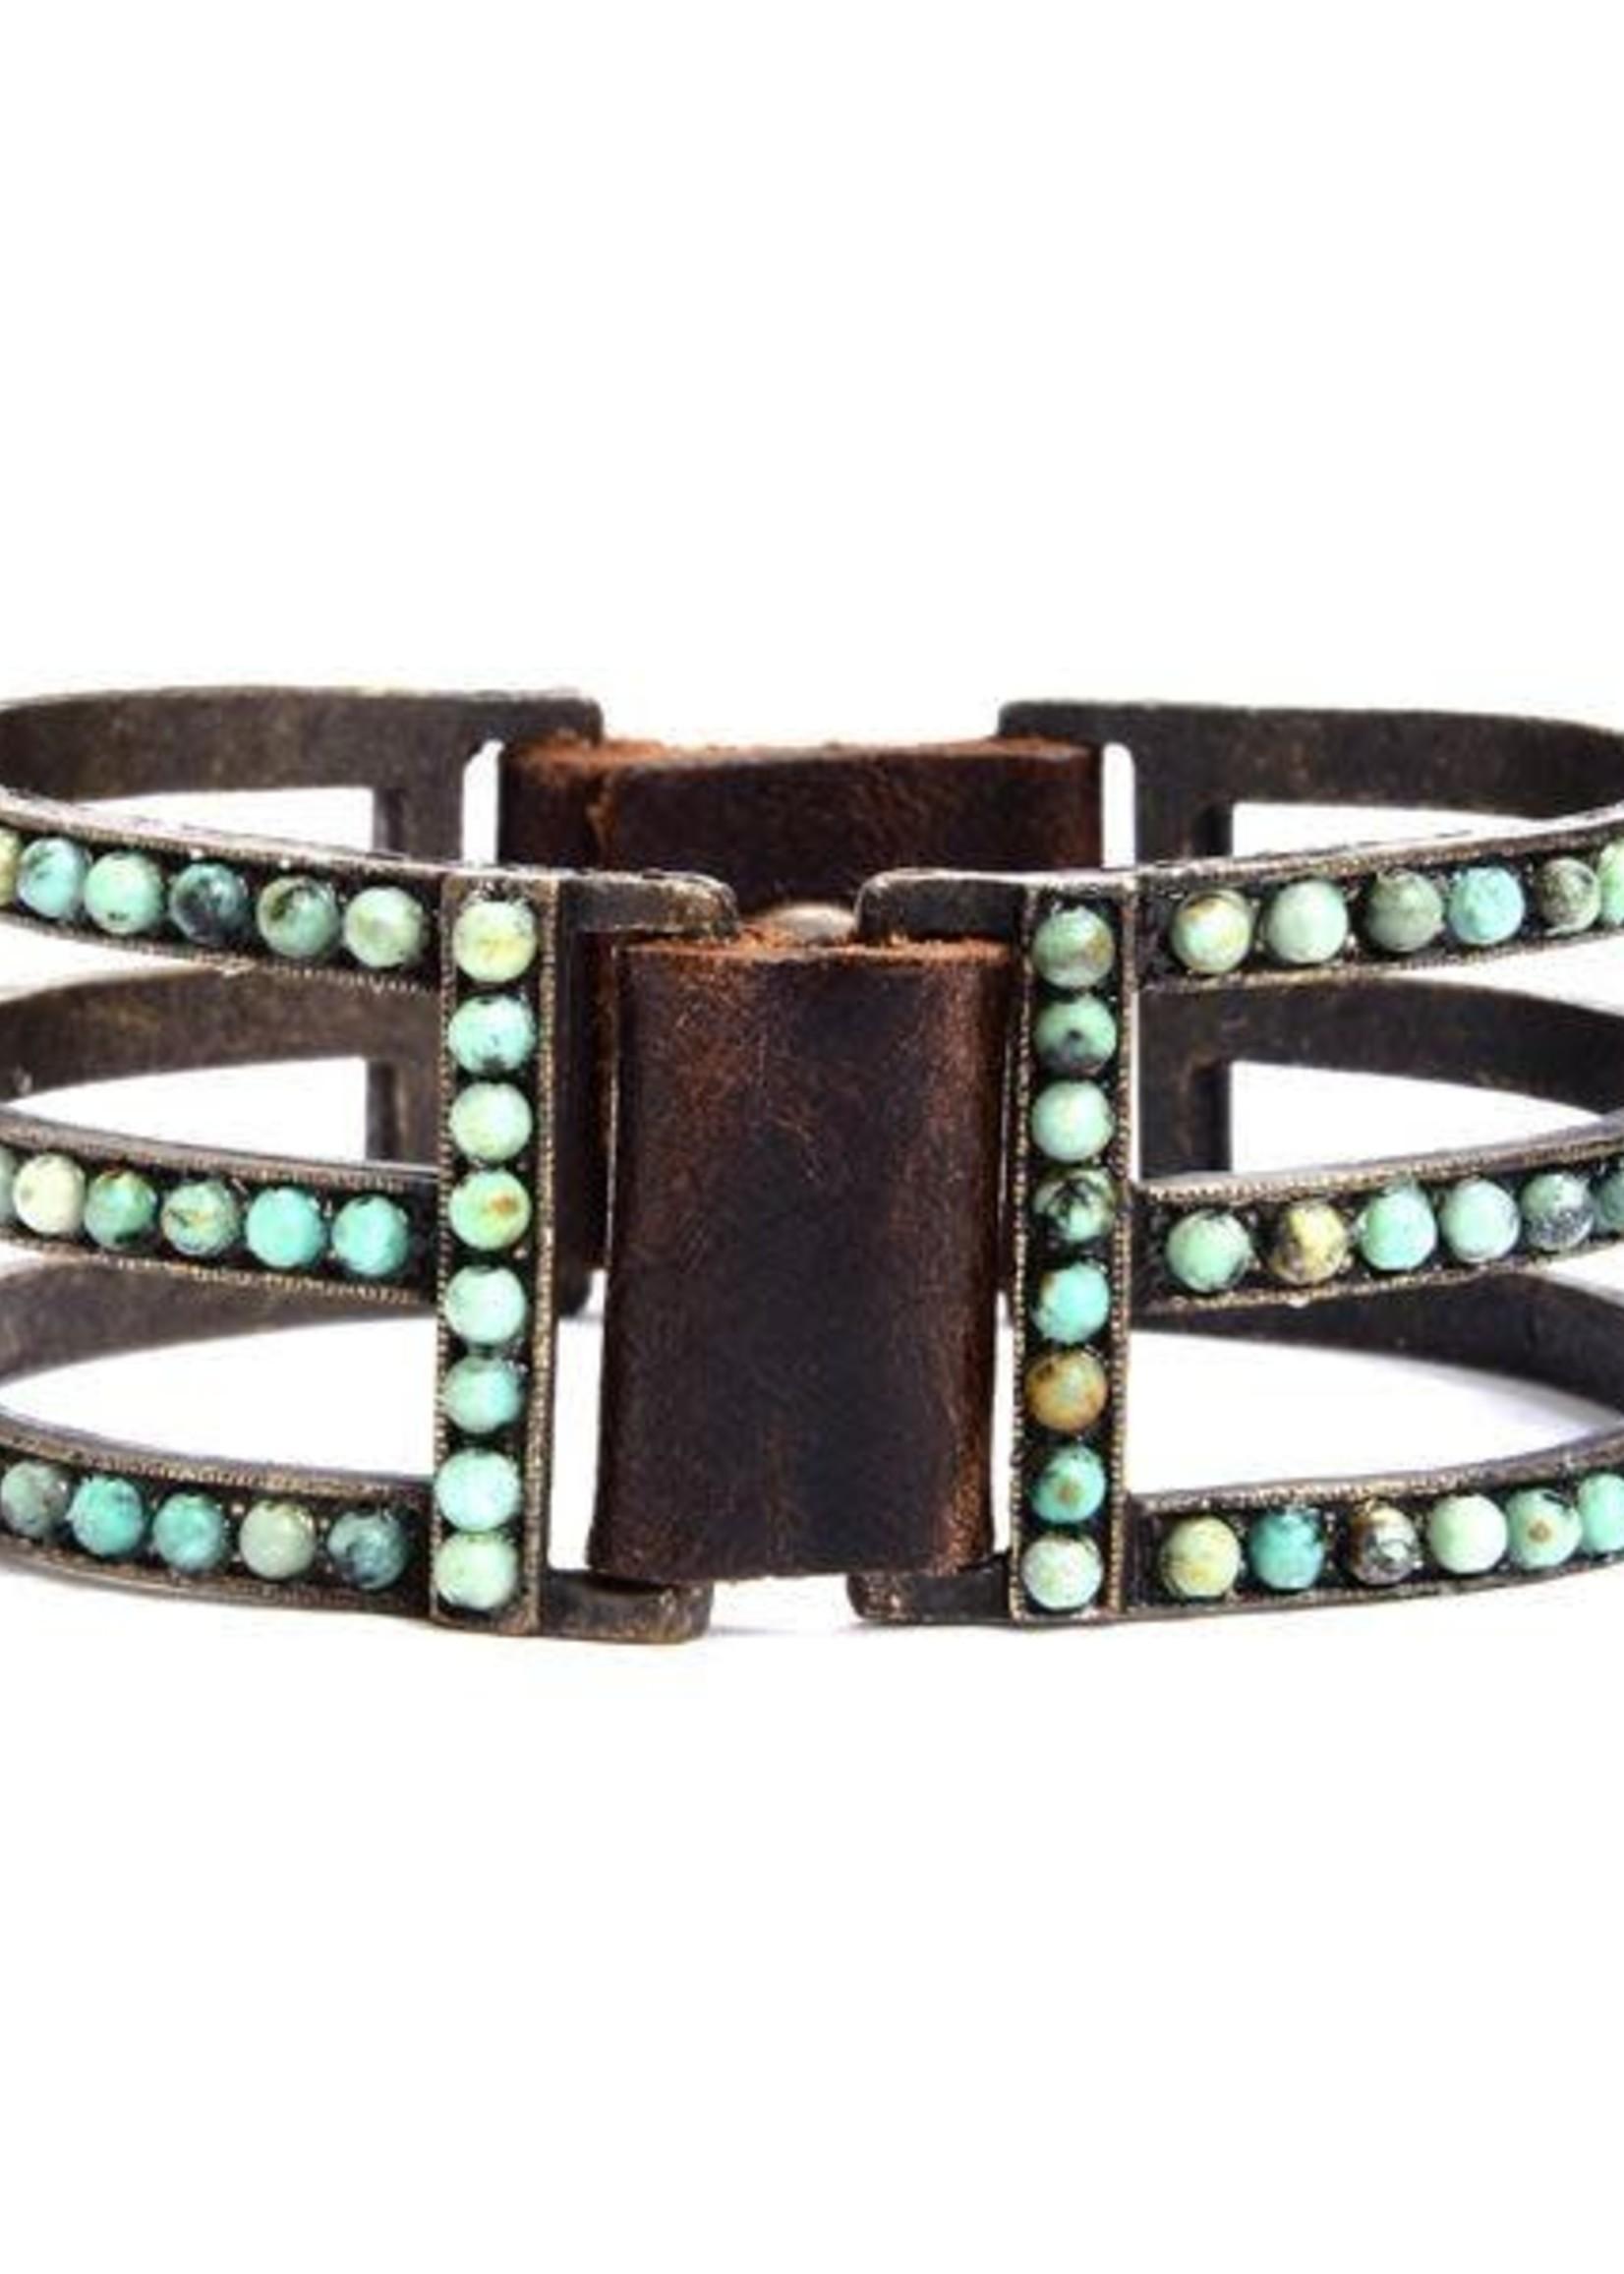 Rebel Designs Rebel - Double Sided Bar Bracelet (1043)